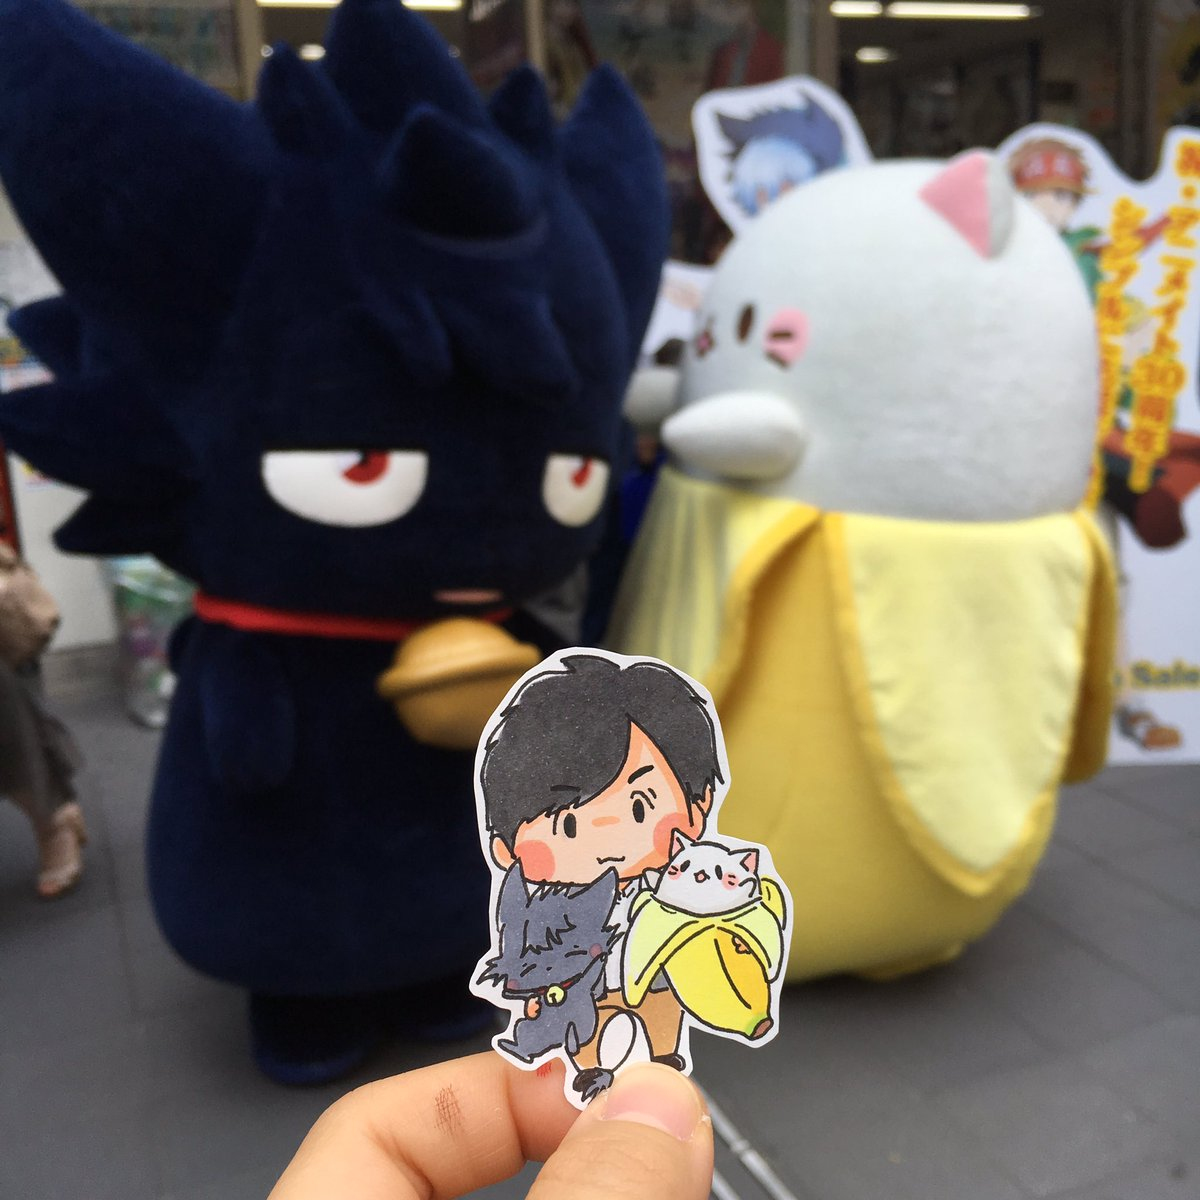 @78pikapri: 猫クロでほのぼのしたアニメを作って欲しい…あ、ばなにゃを見ろと?